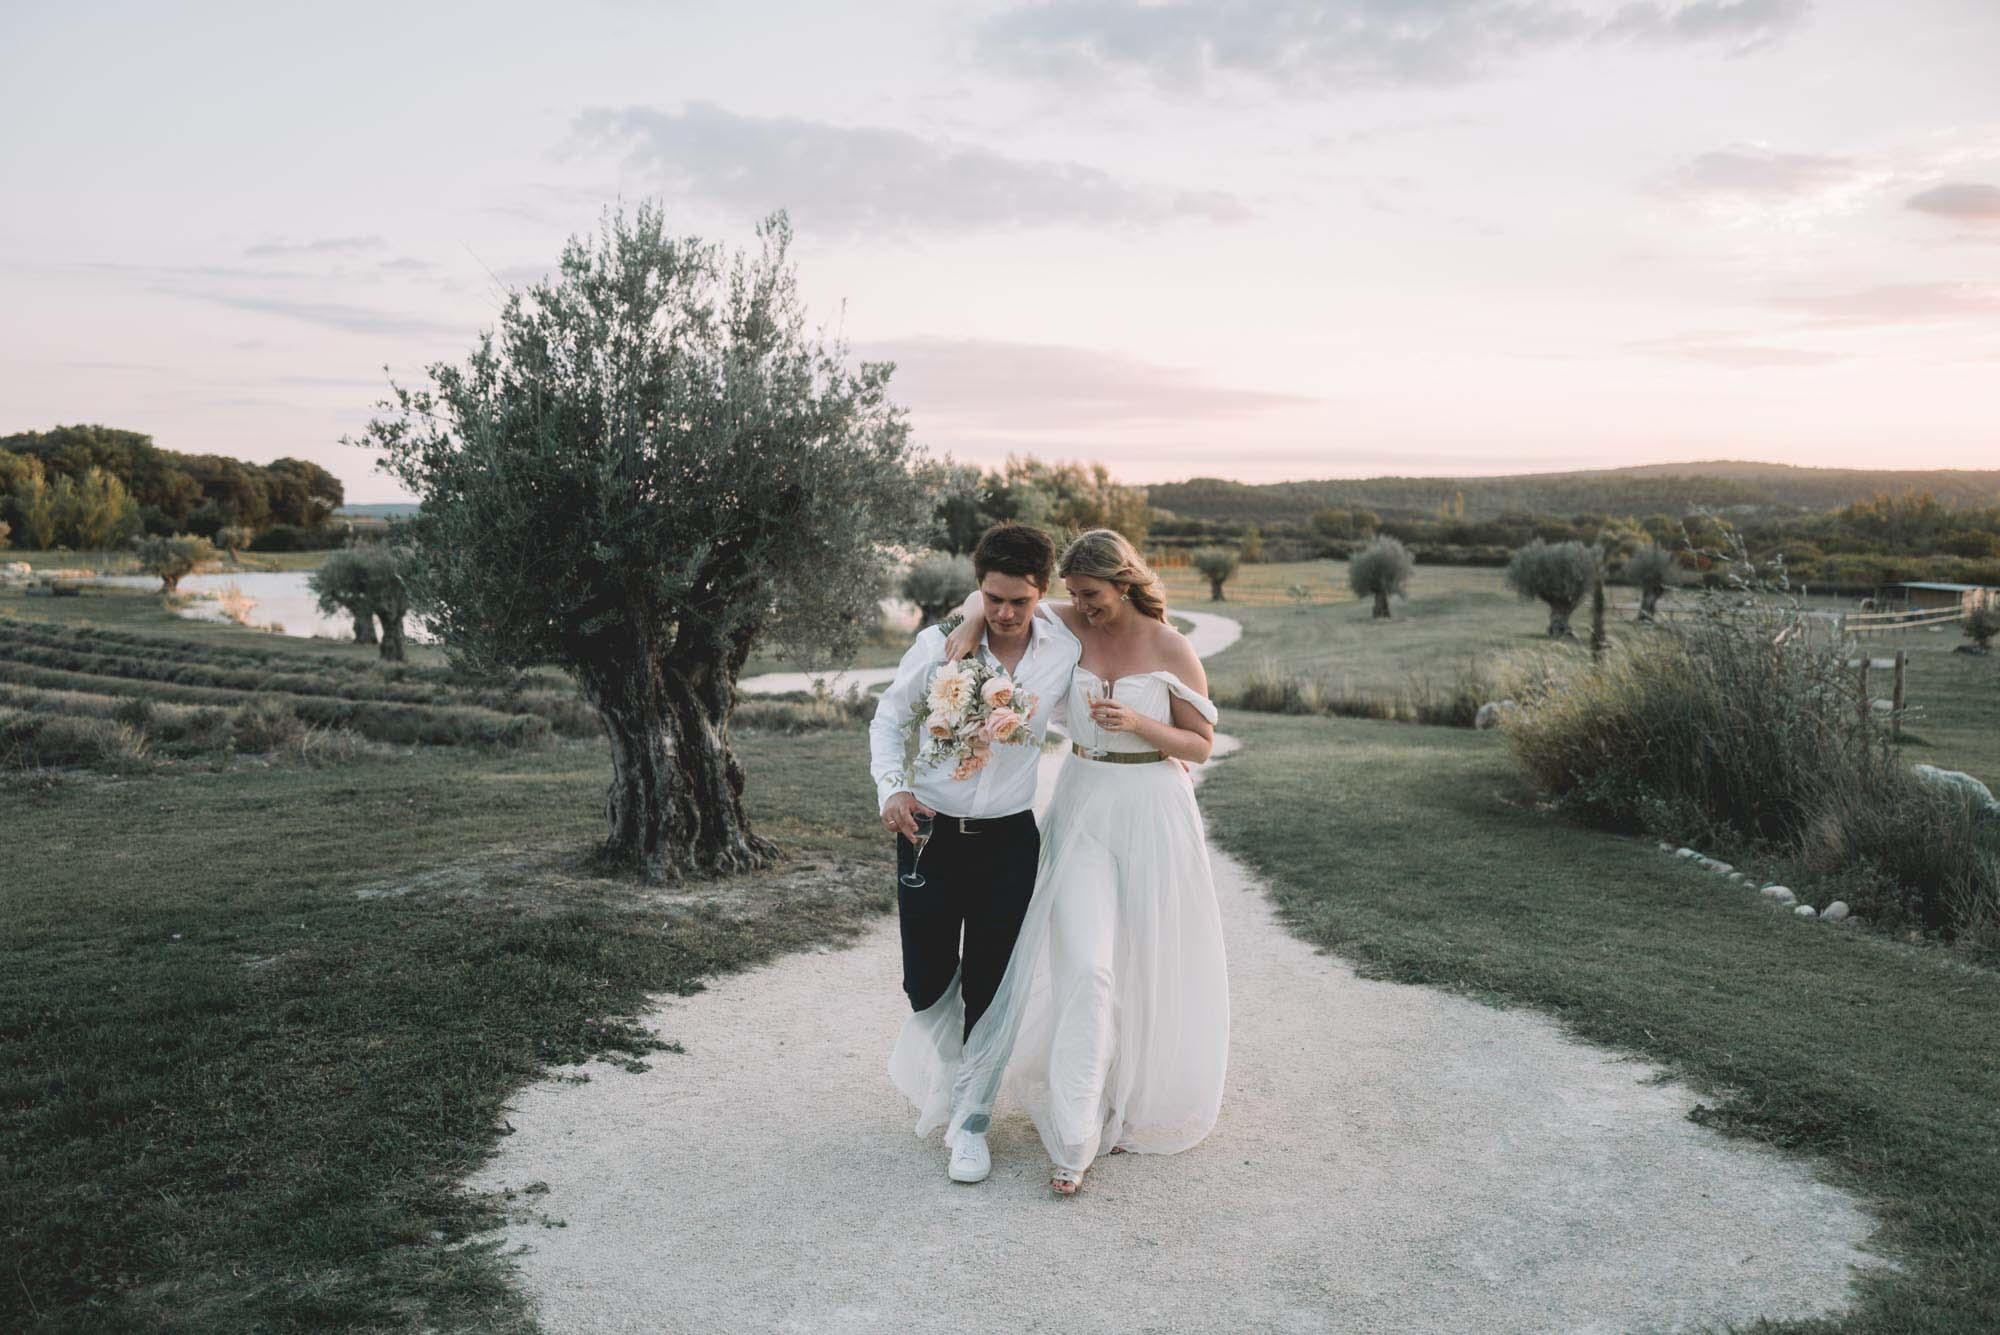 KATHARINA + DIMITRI_DOMAINES DE PATRAS_PHOTOGRAPHE MARIAGE_LES BANDITS-14